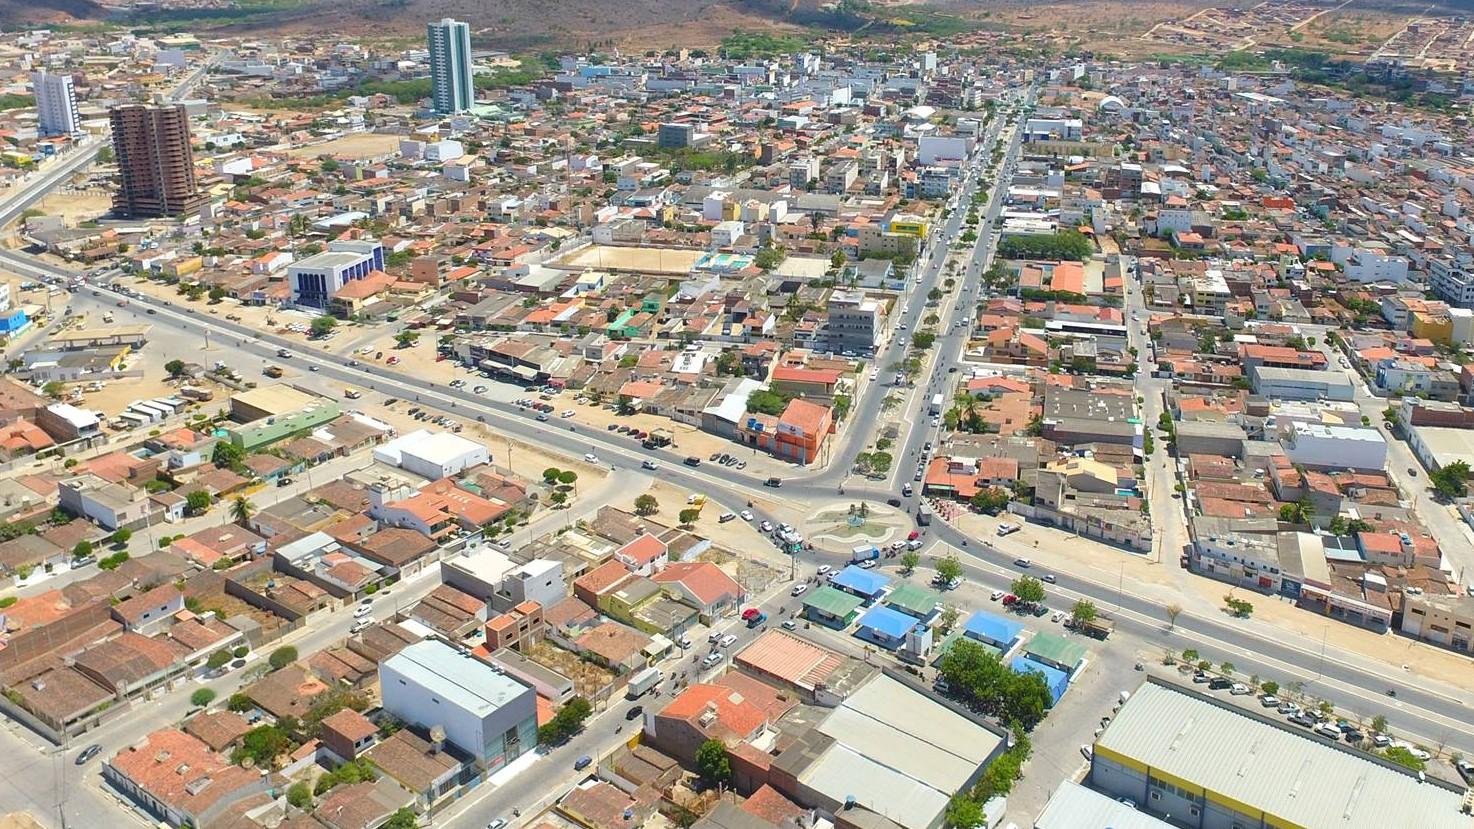 Santa Cruz Pernambuco fonte: upload.wikimedia.org